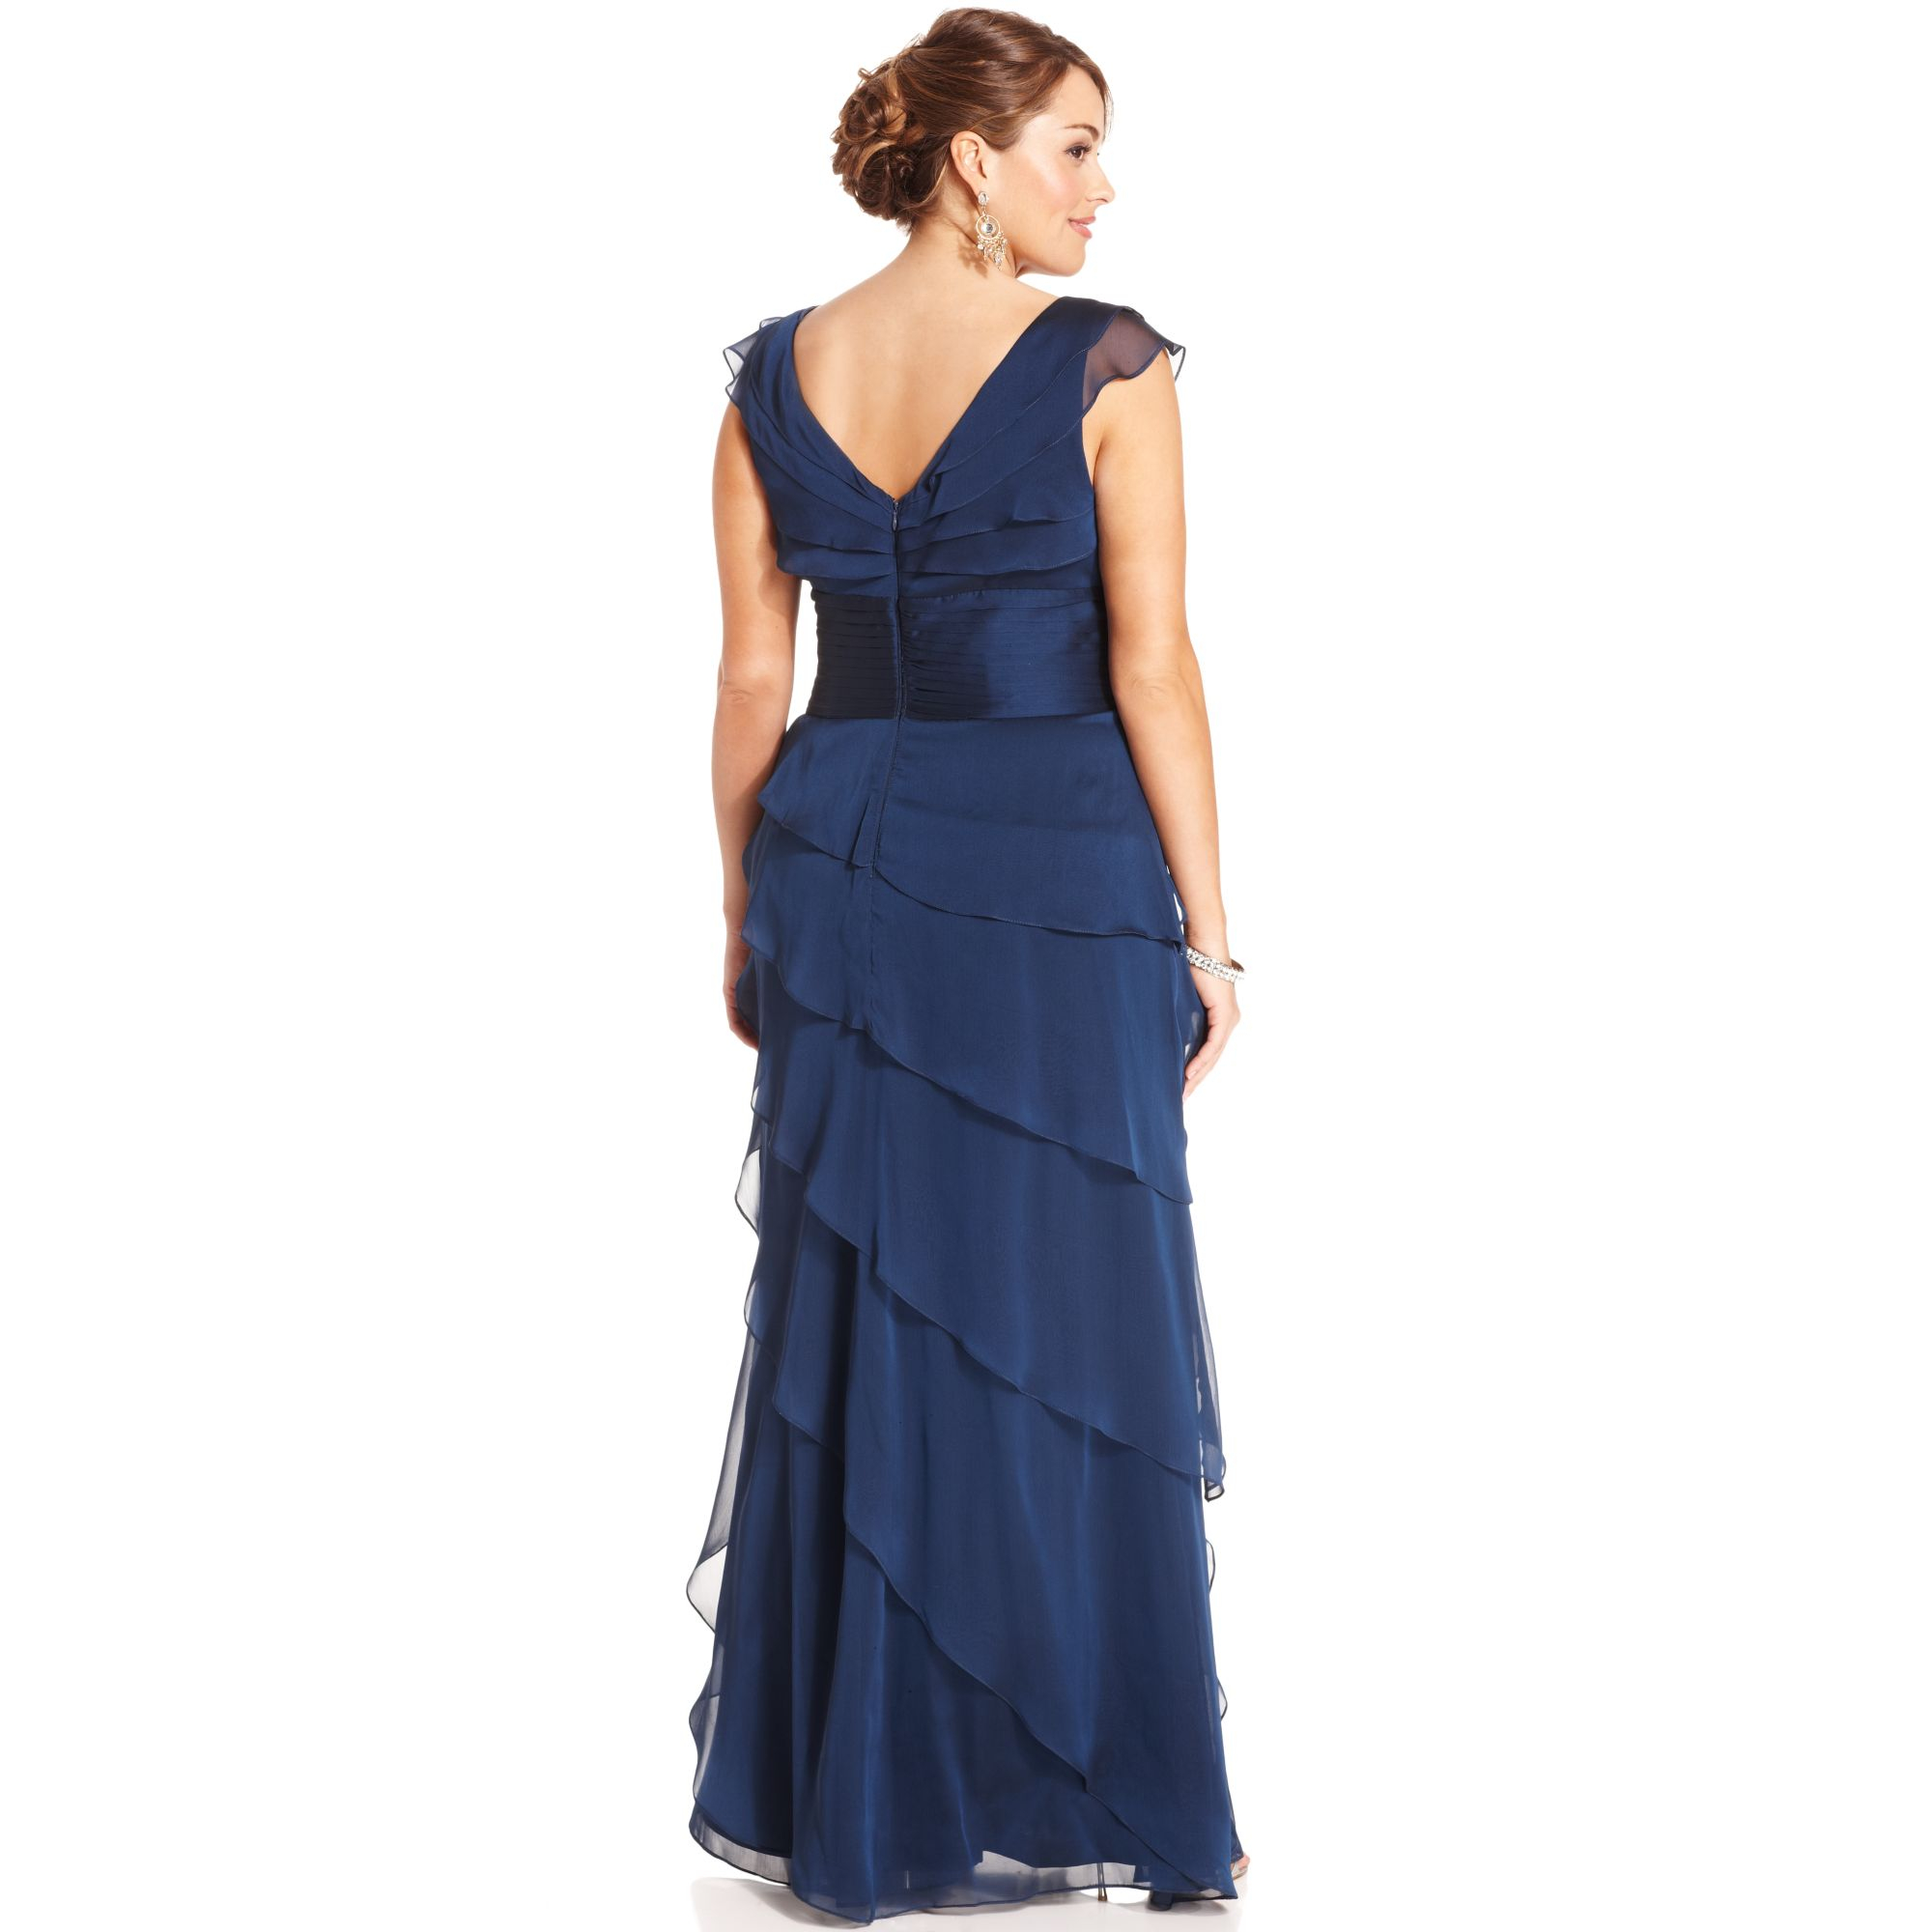 Lyst Adrianna Papell Sleeveless Tiered Empire Waist Evening Gown